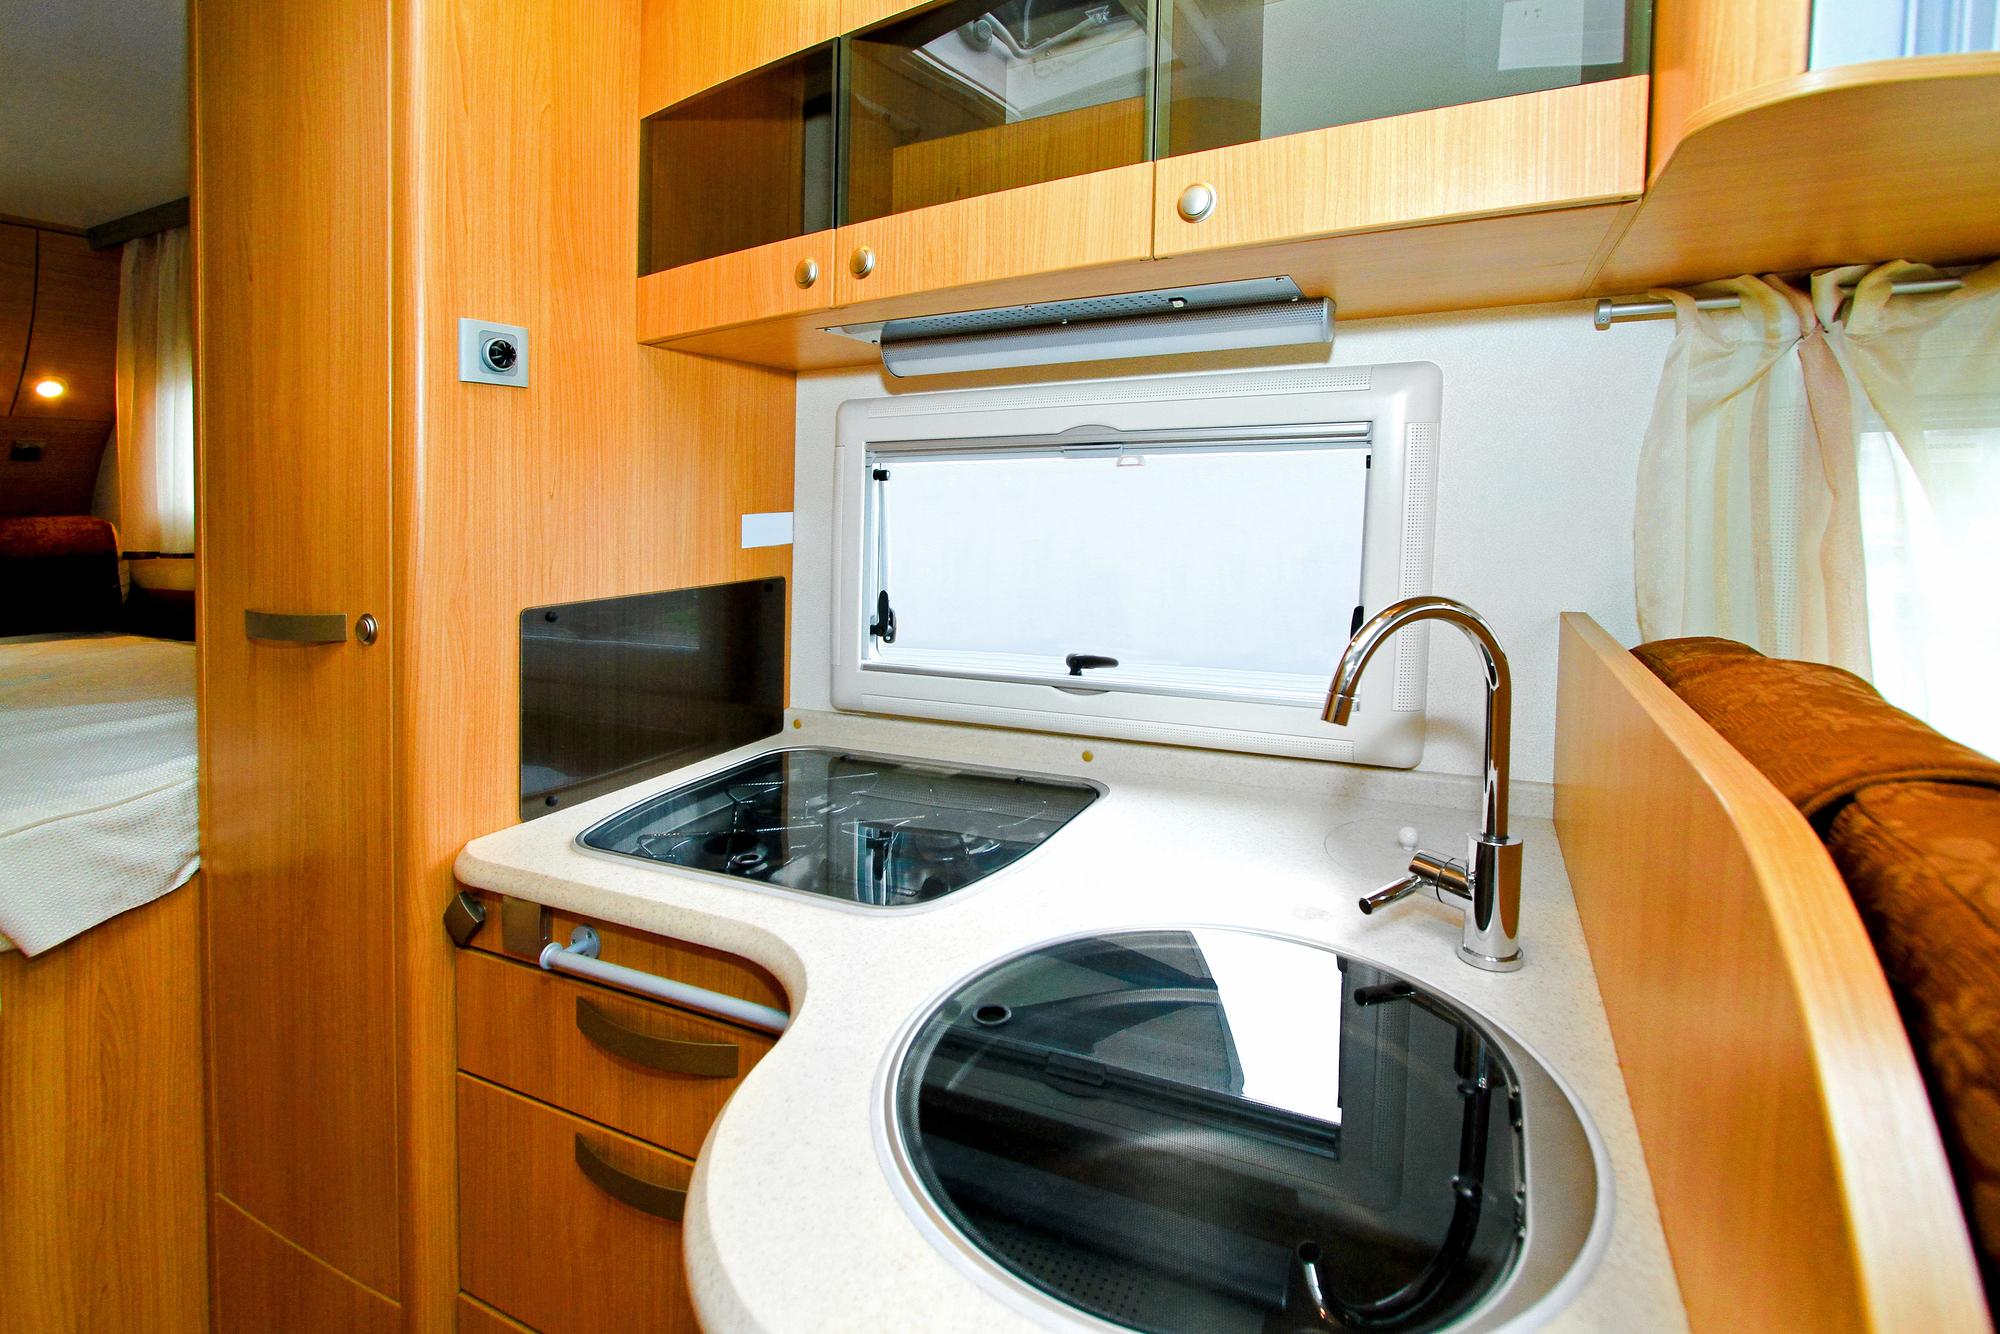 Caravan kitchen repairs and upgrades